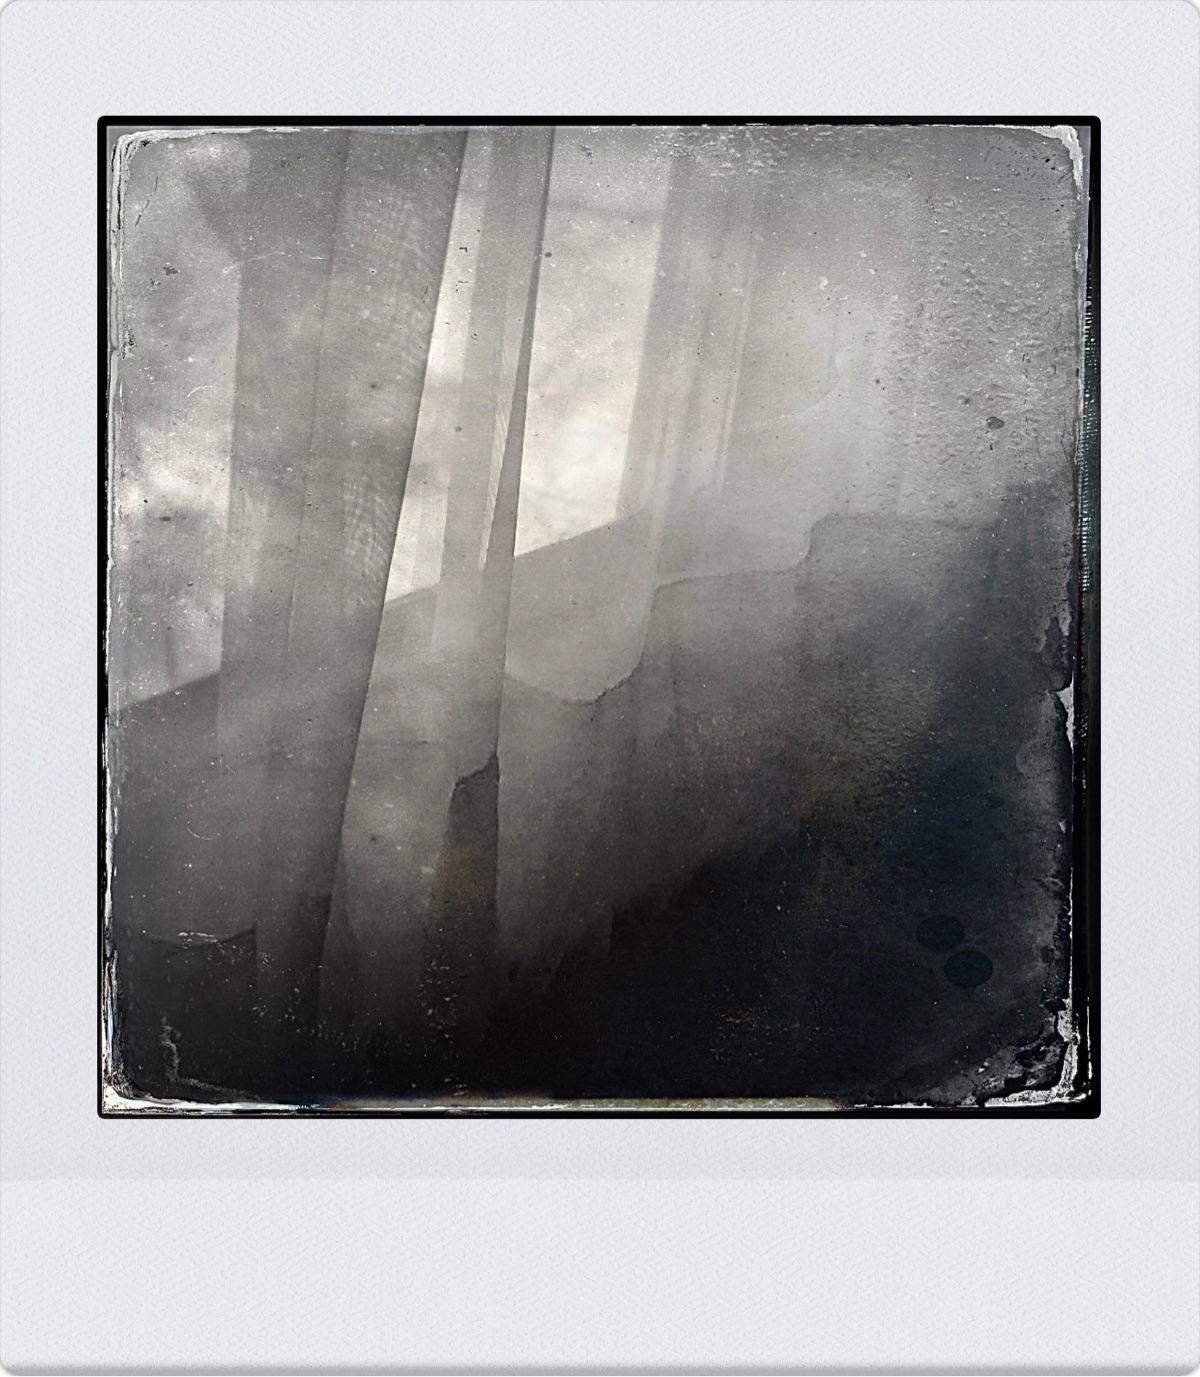 Abstract 1/24/2021 - iphonephotography#blackandwhitephotography - naturesmiles | ello